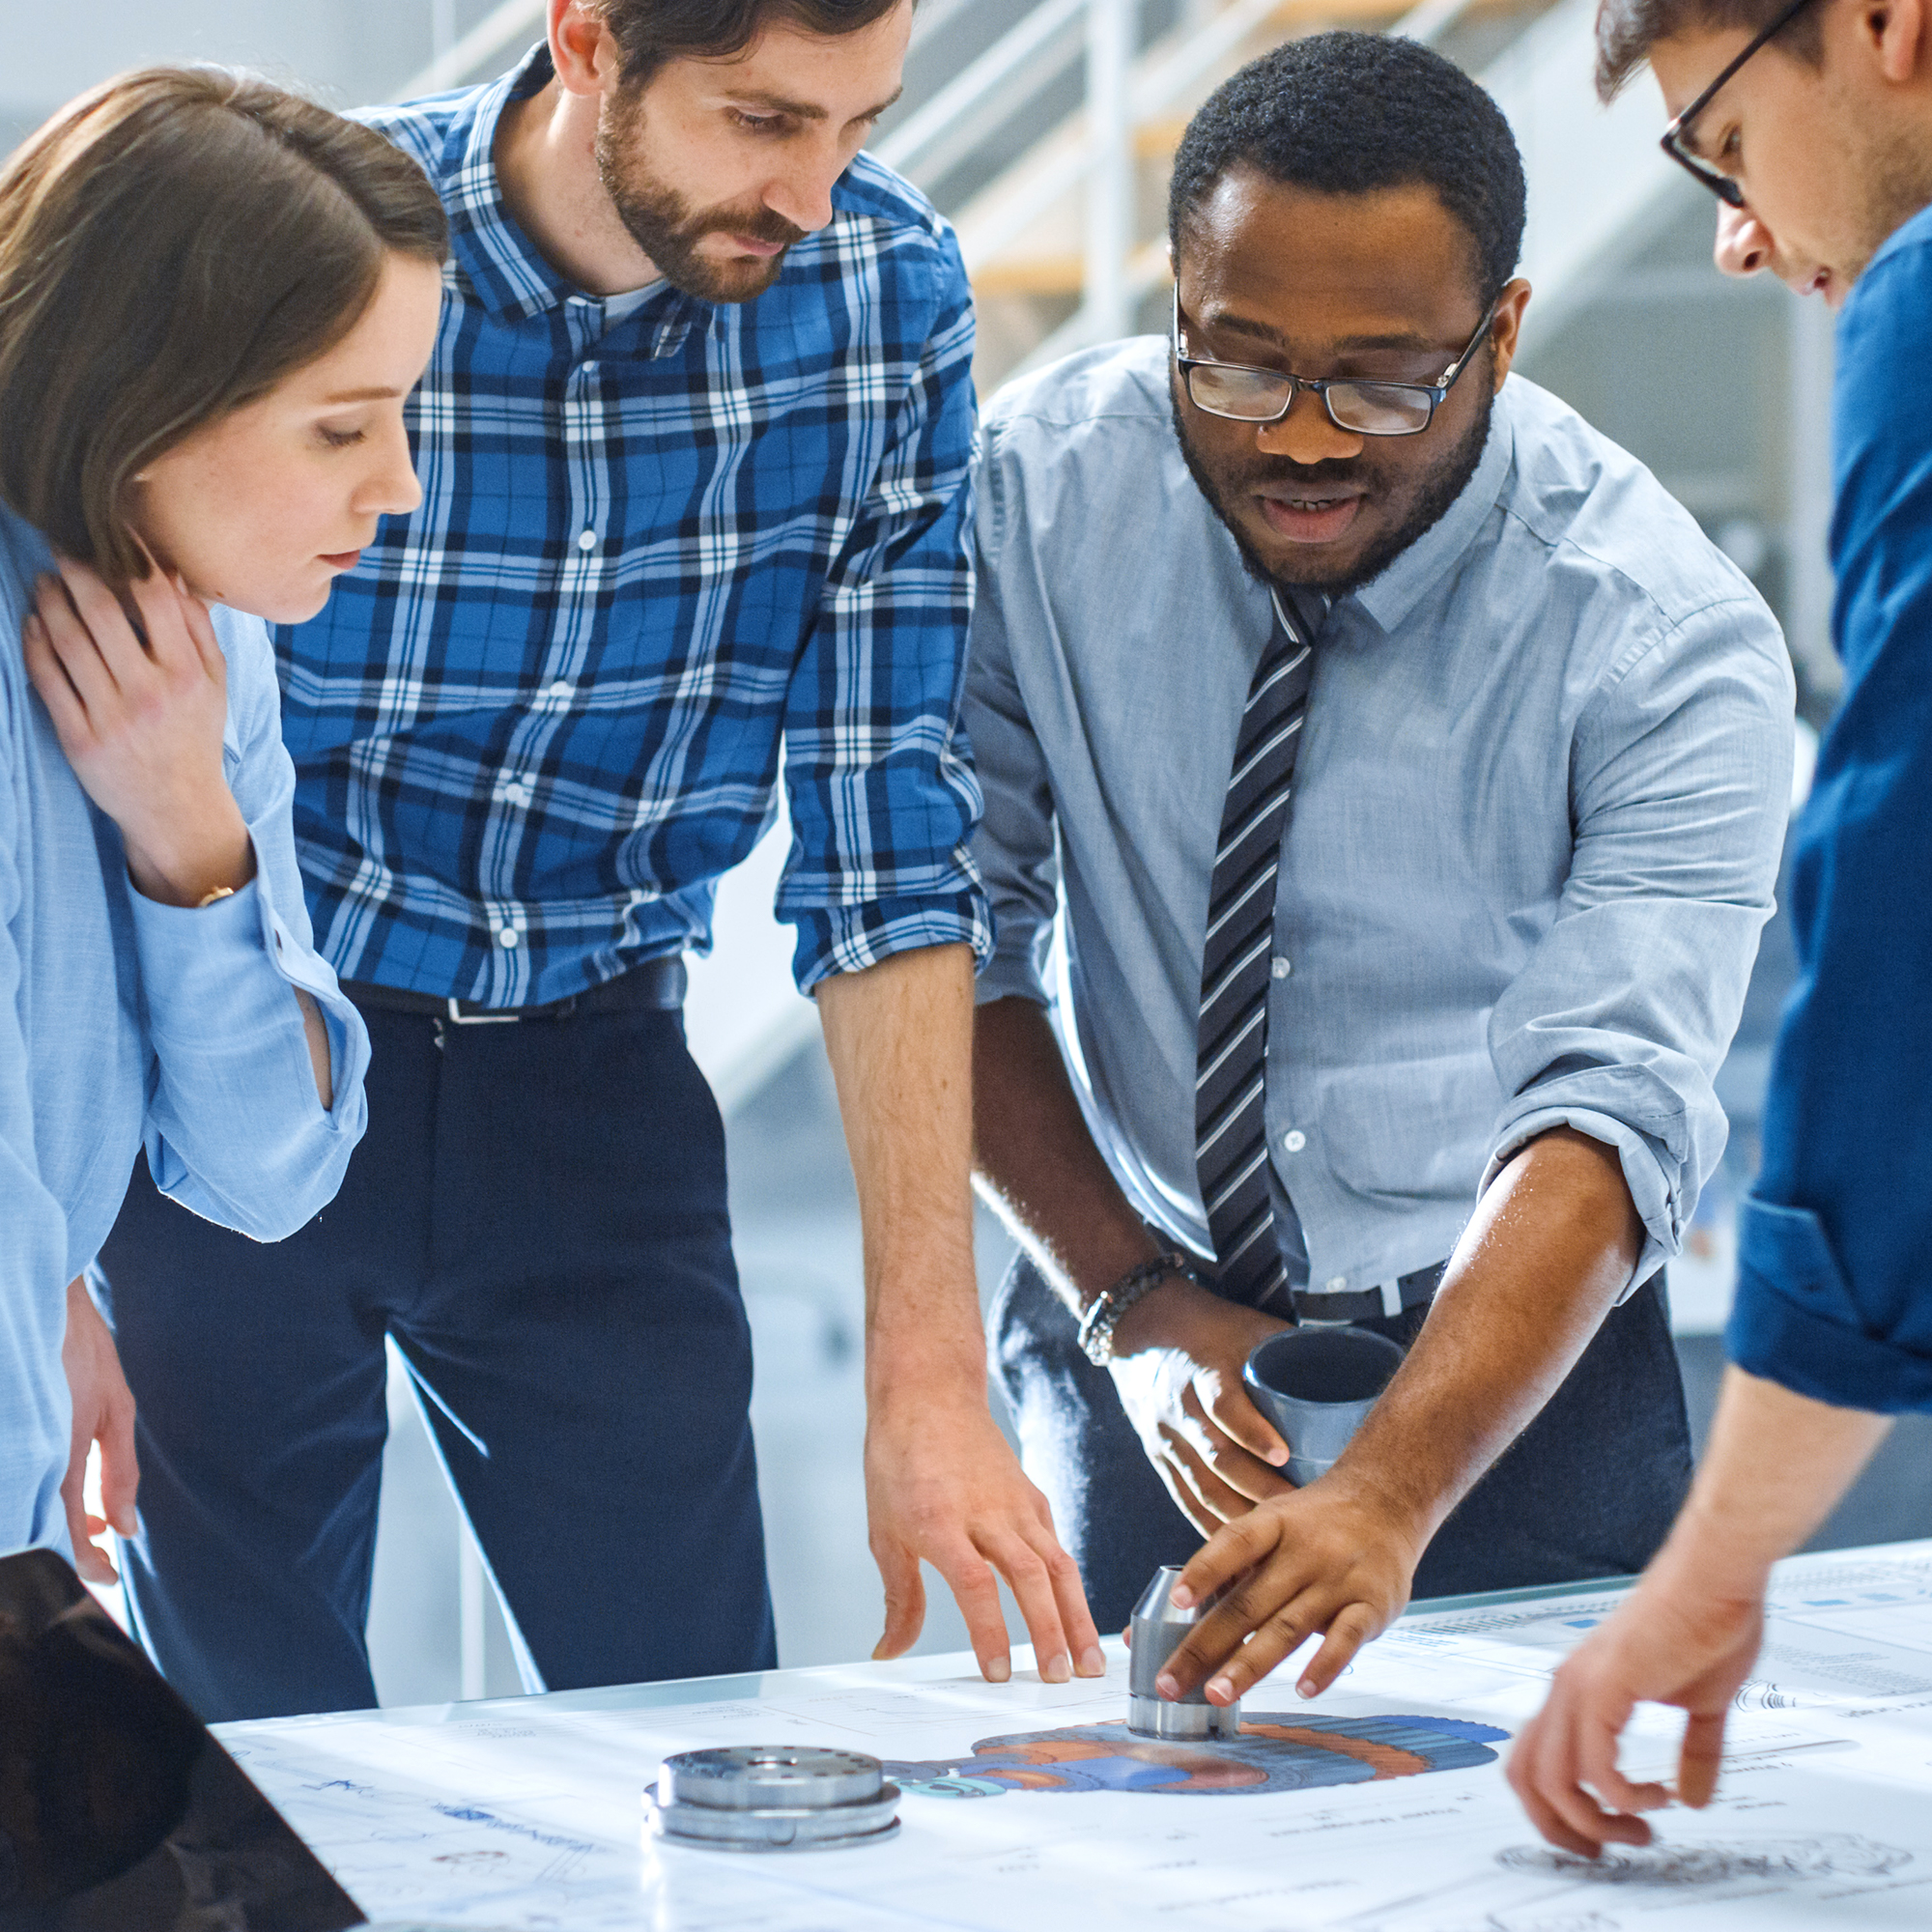 Design Opps Team Discussion